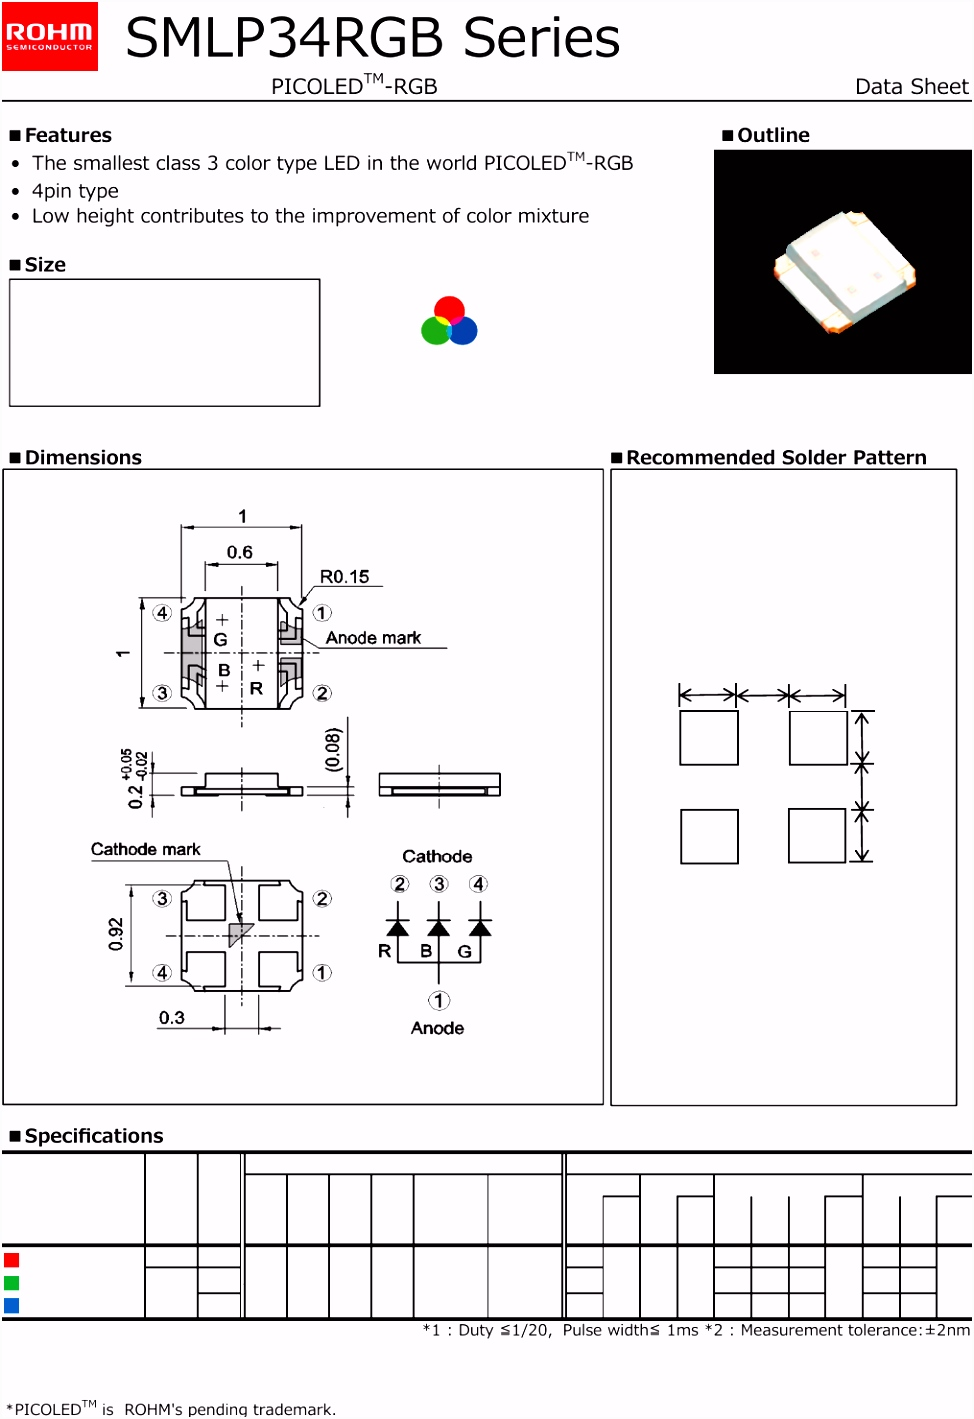 SMLP34RGB Series Datasheet Rohm Semiconductor